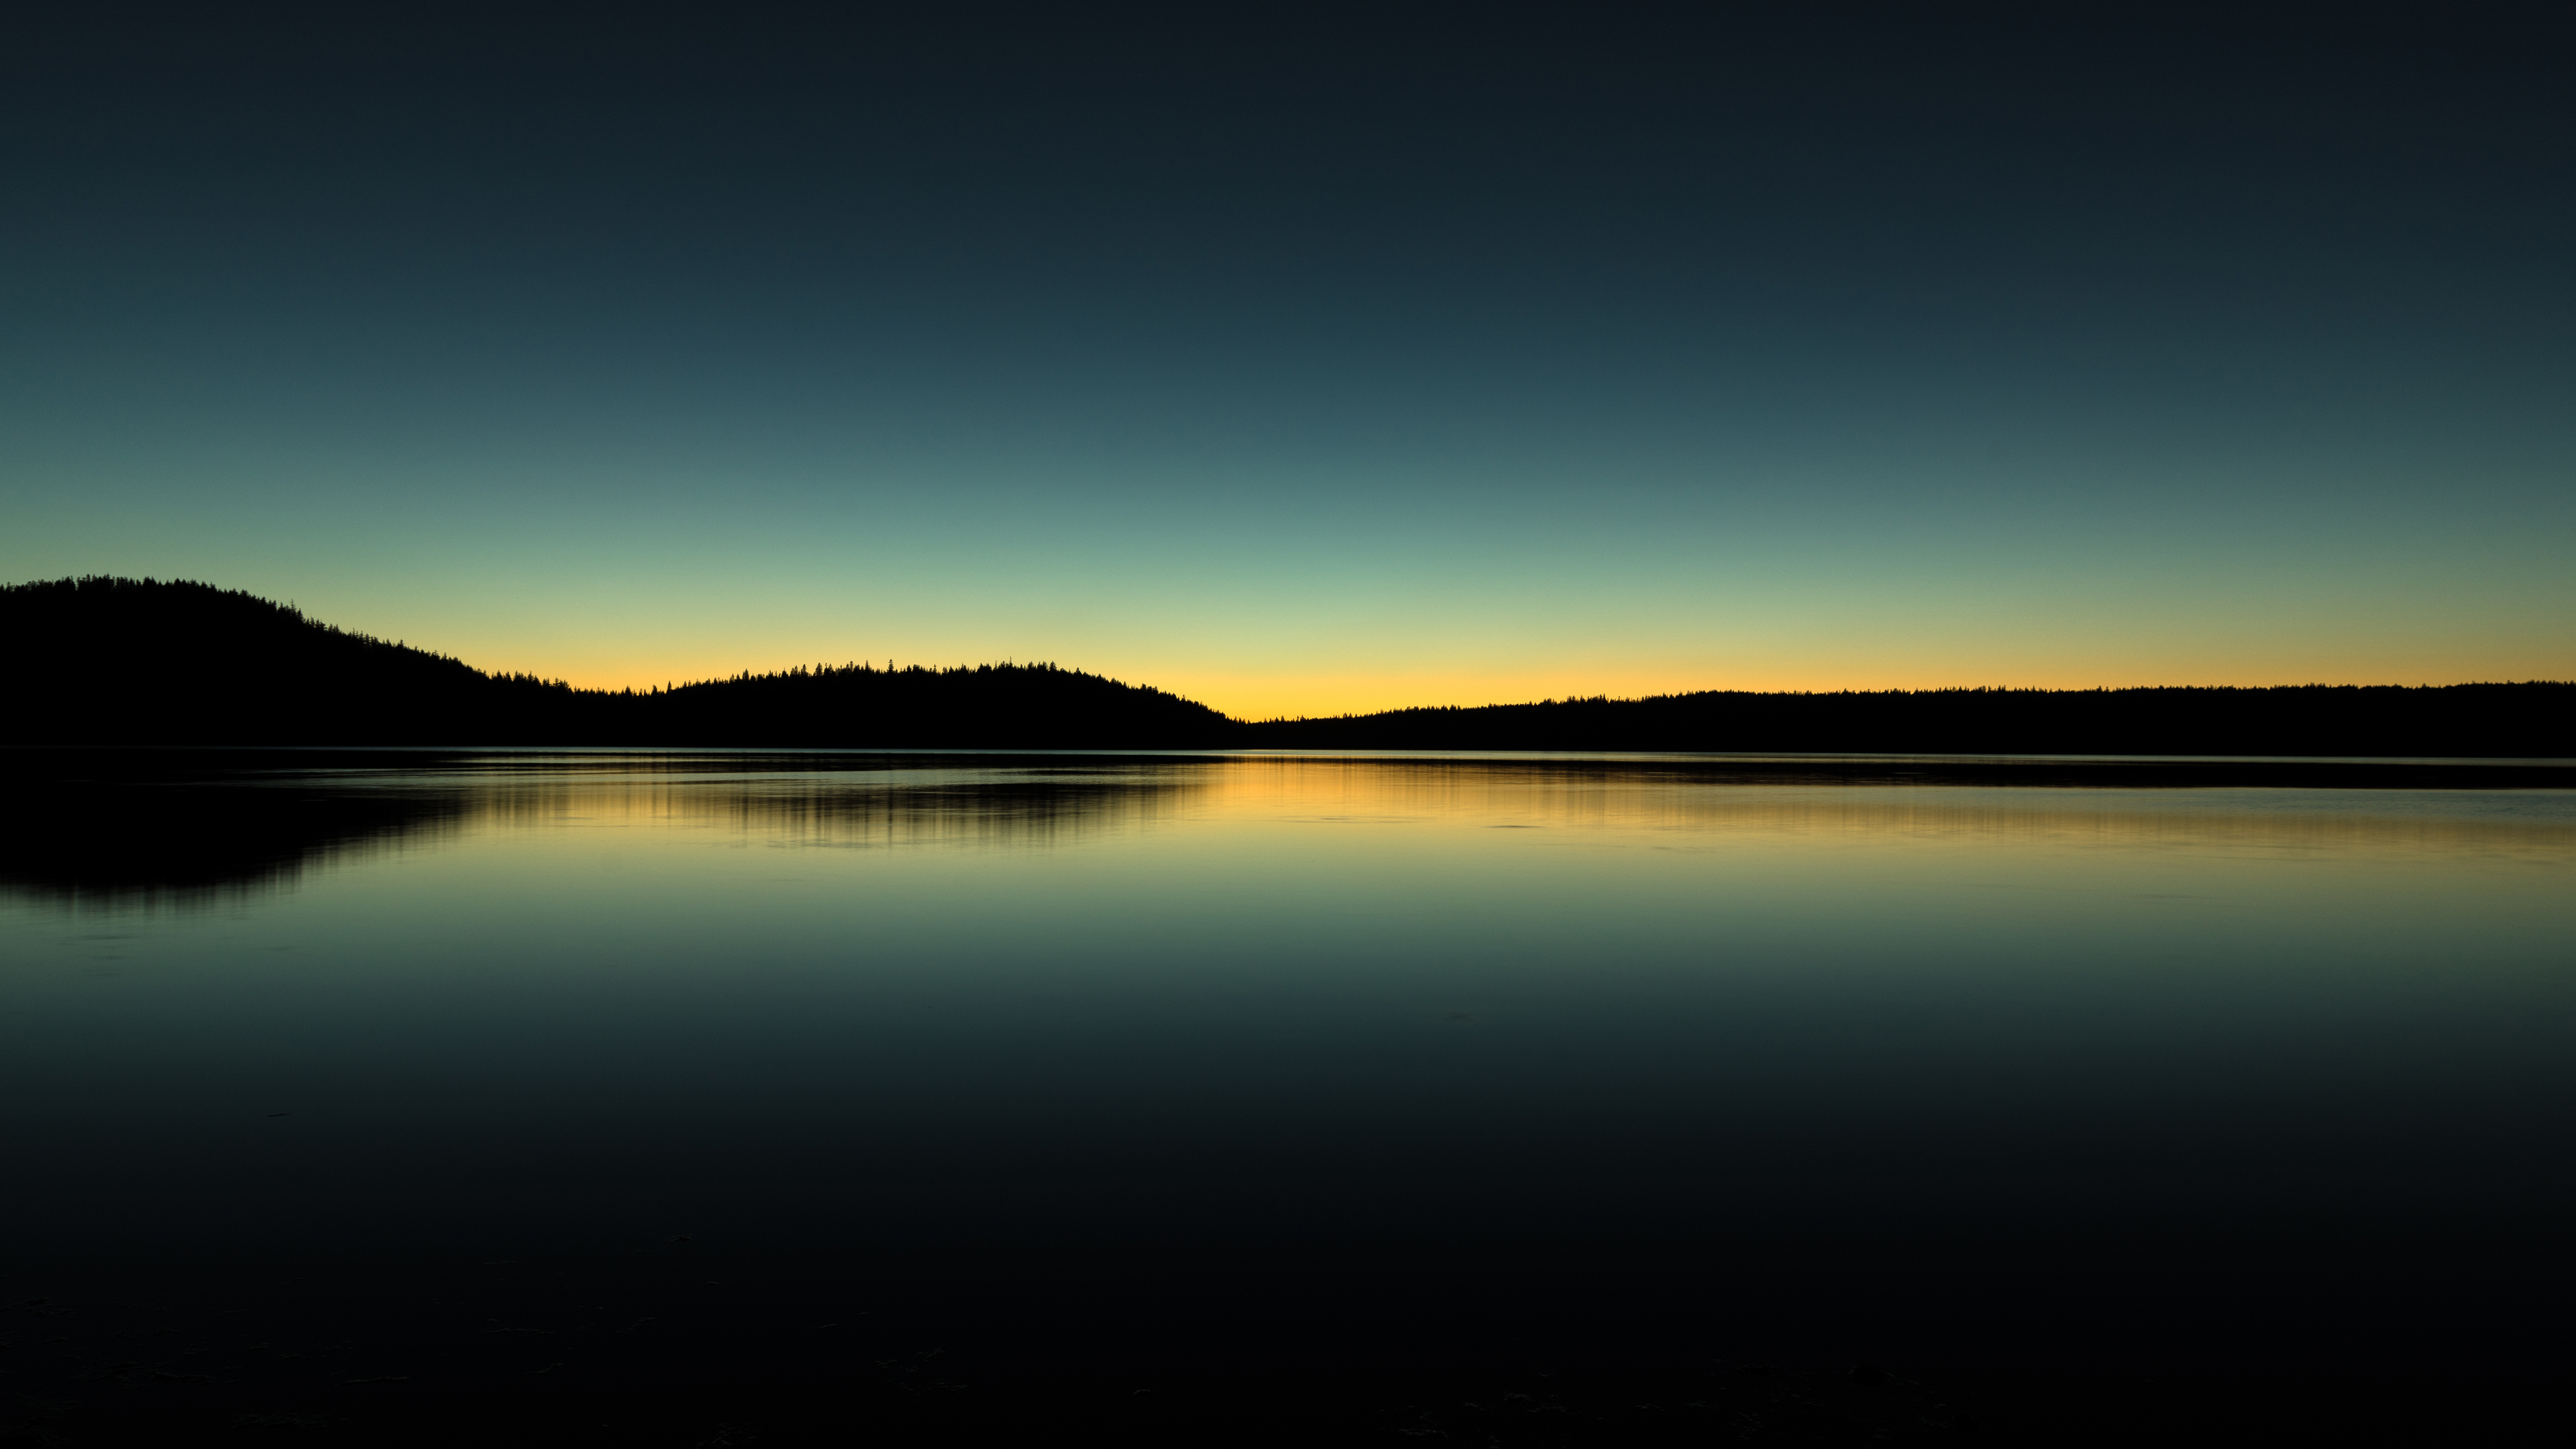 sharp lake windows 10 wallpaper nature 4k 4096x2304